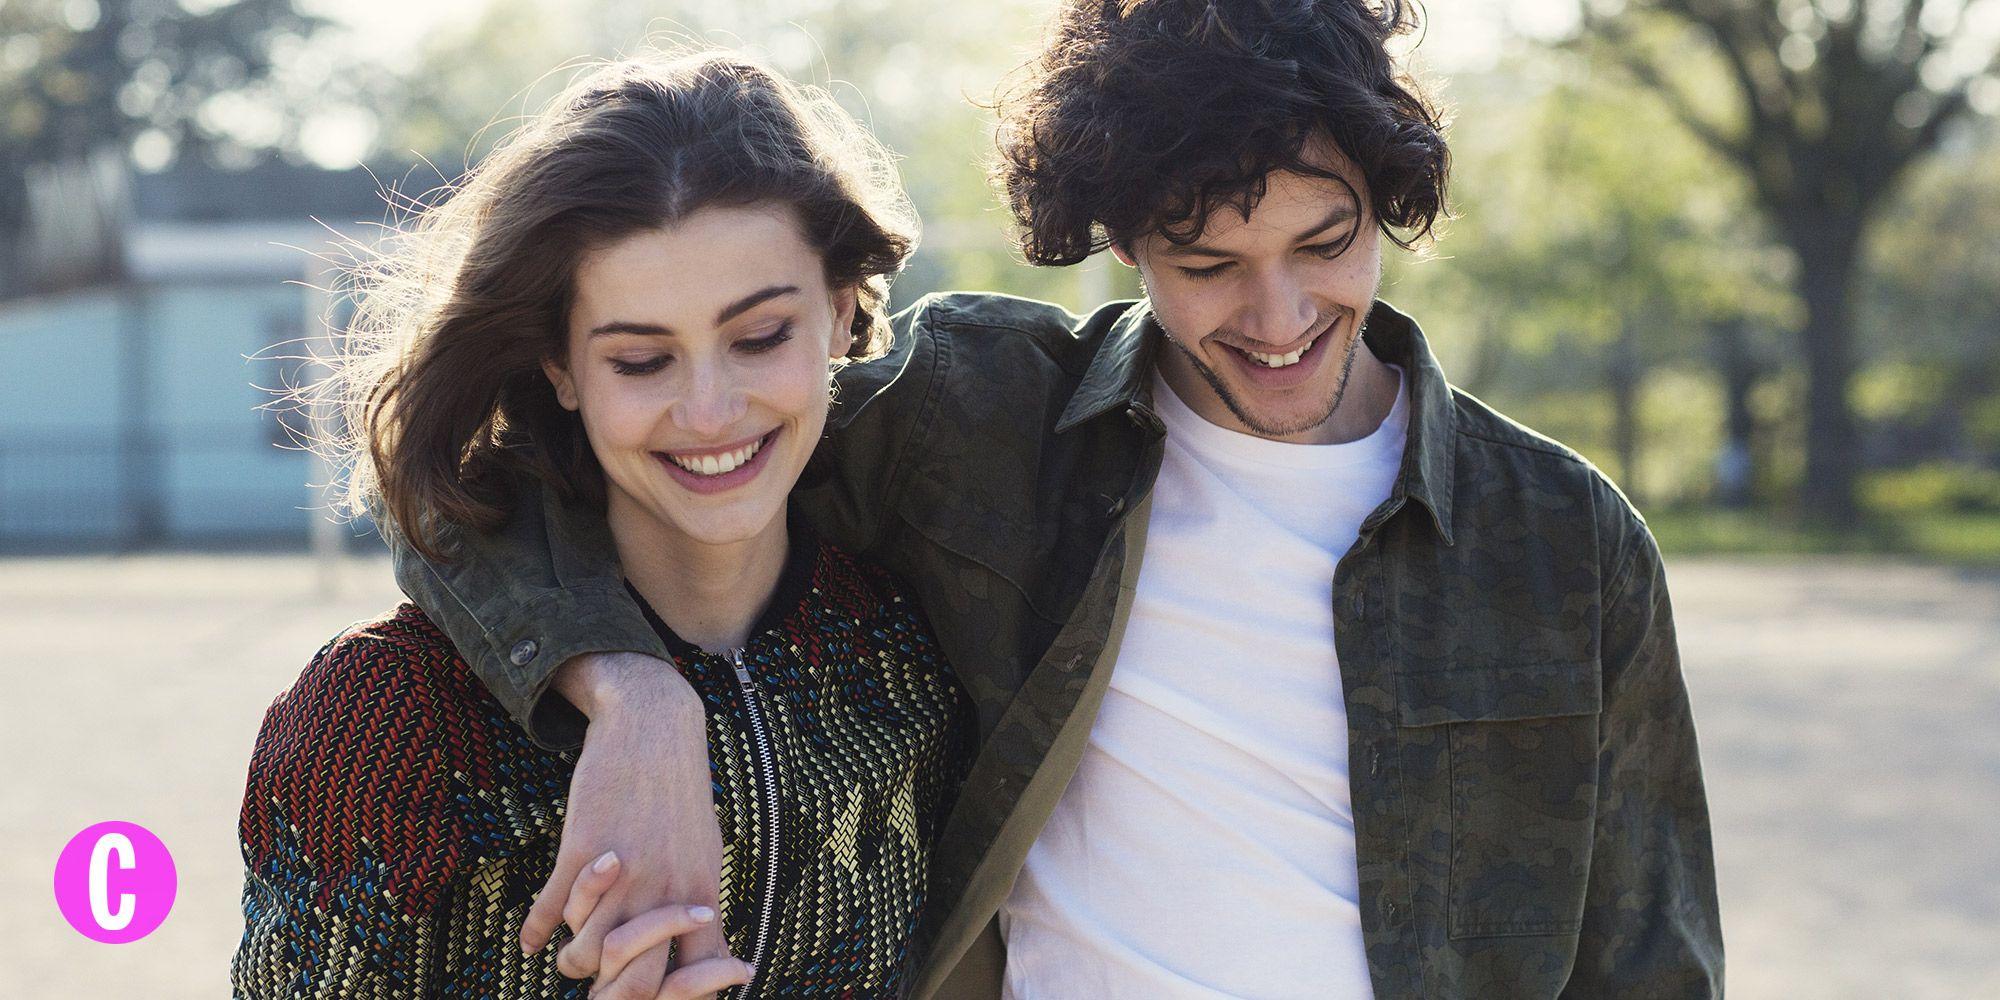 Una coppia sorridente ed affiatata